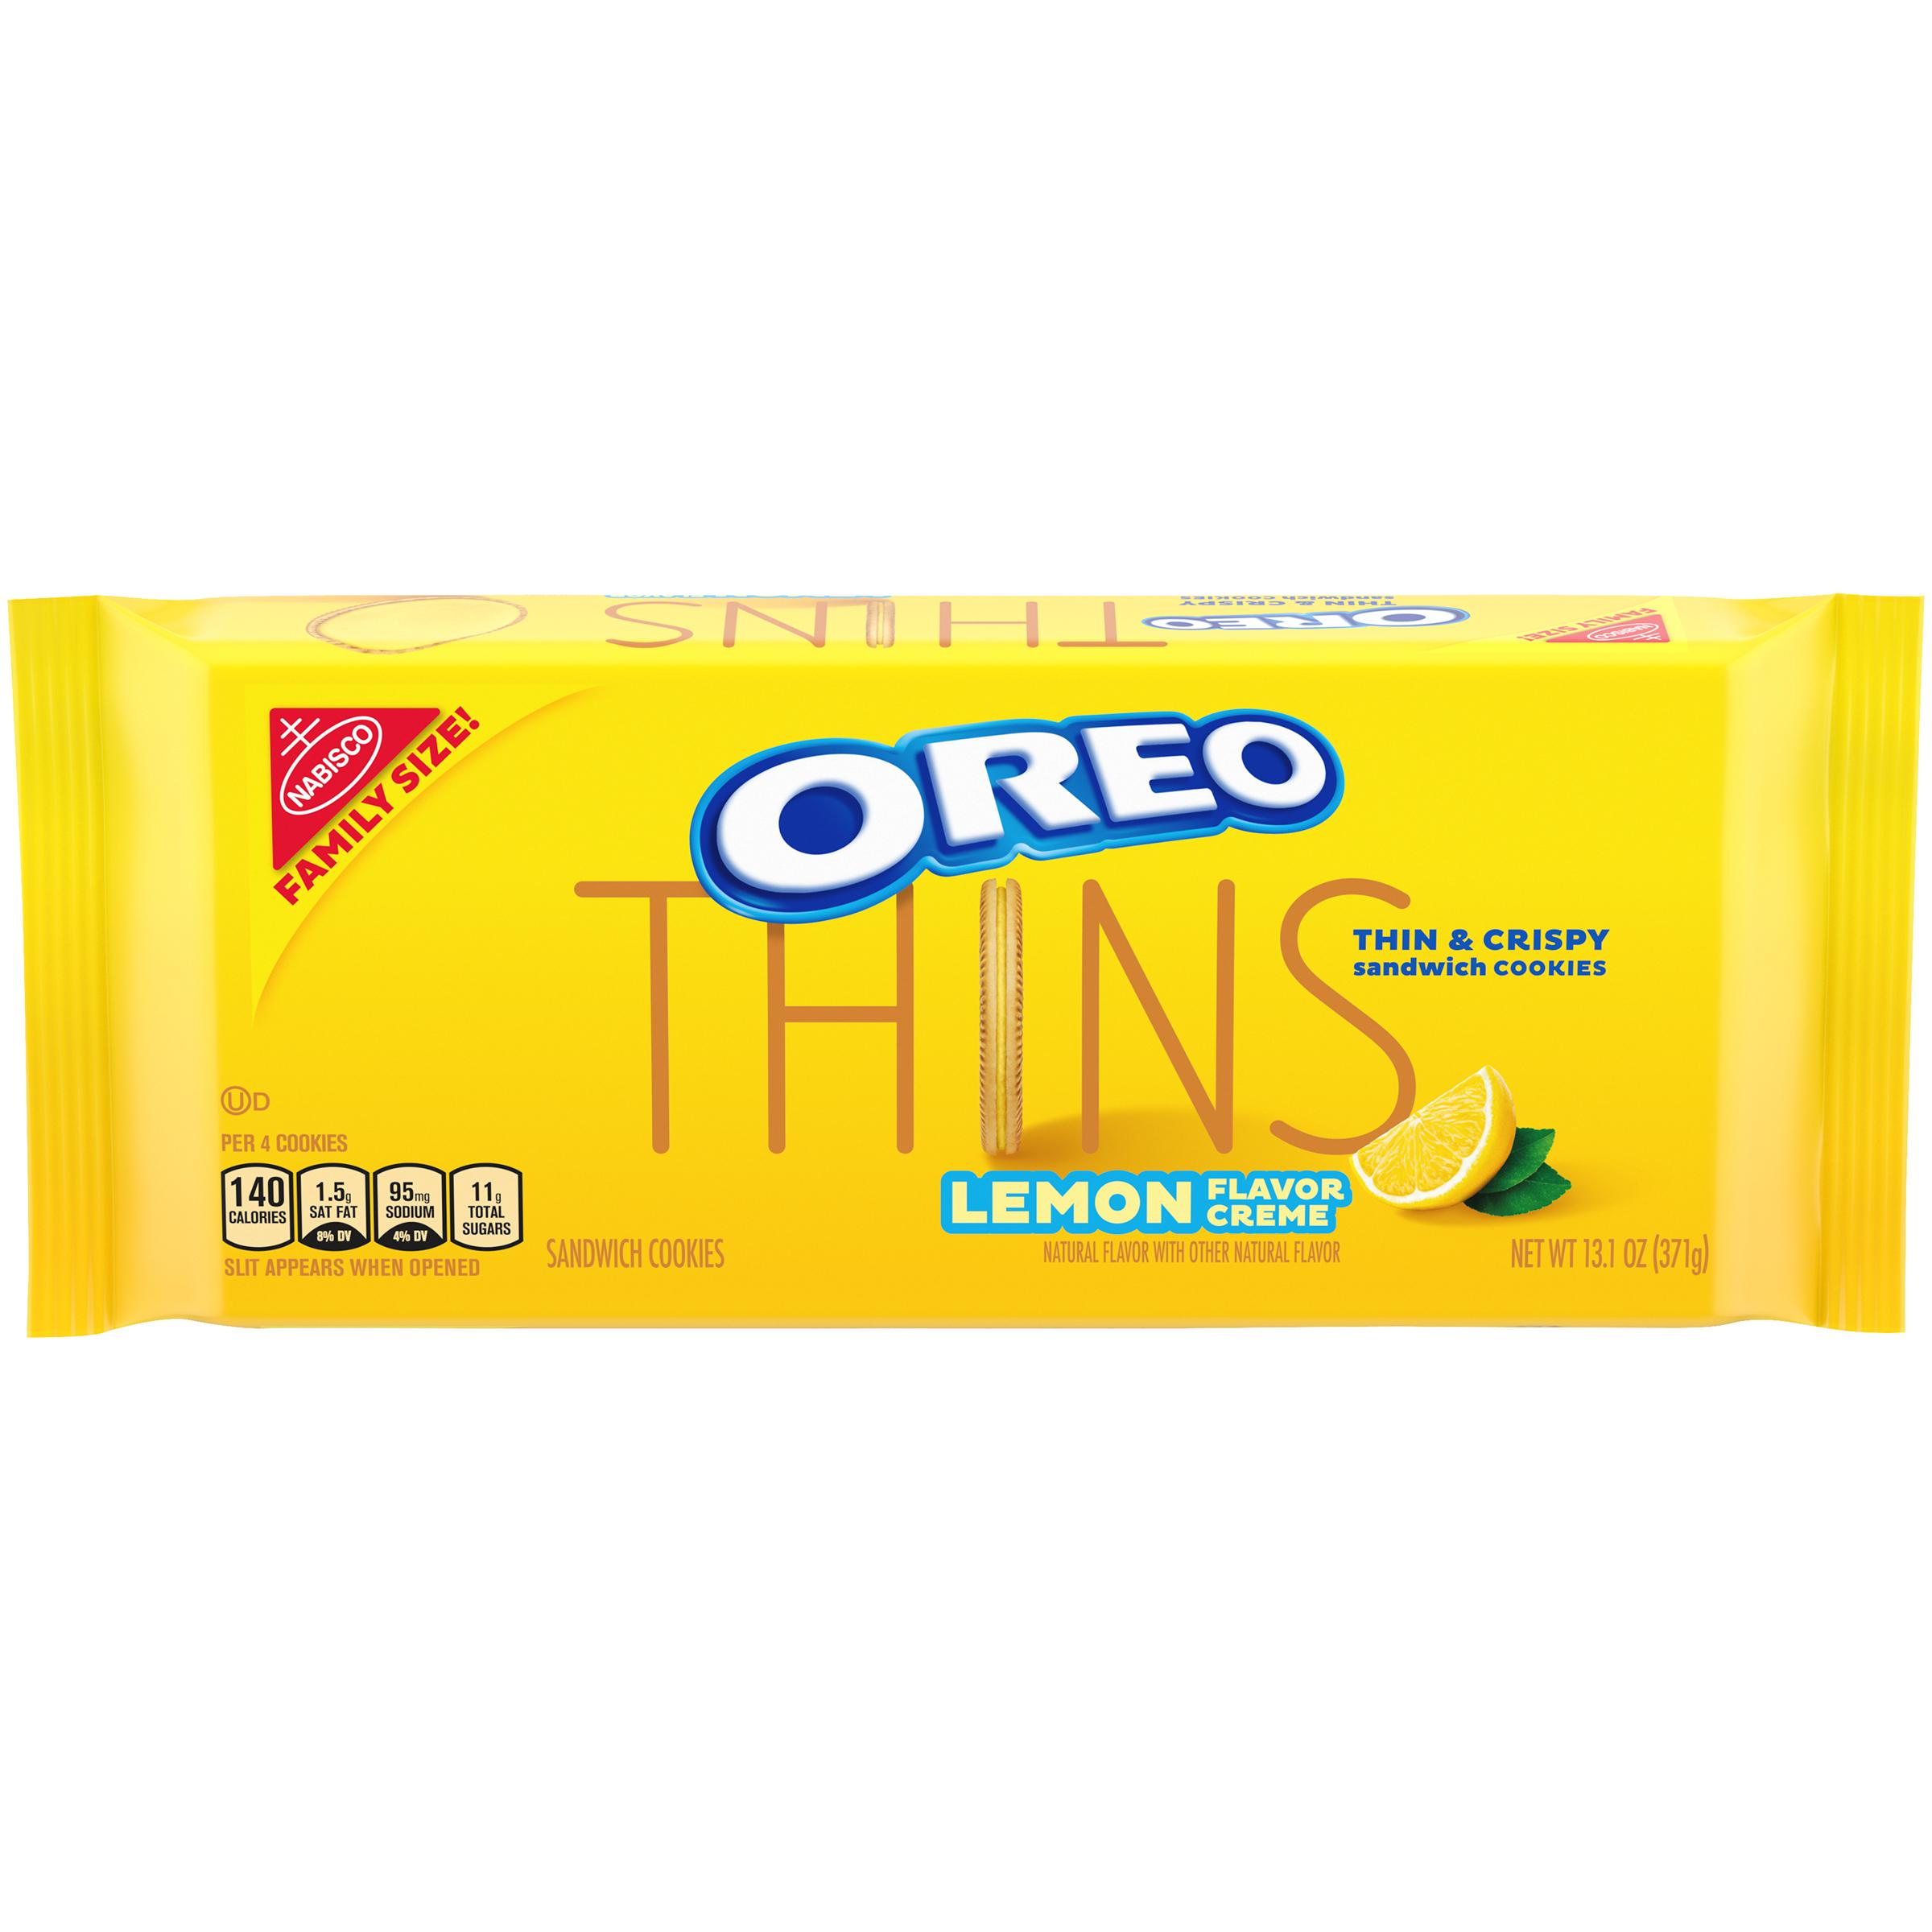 OREO Thins Lemon Cookies 11.6 oz